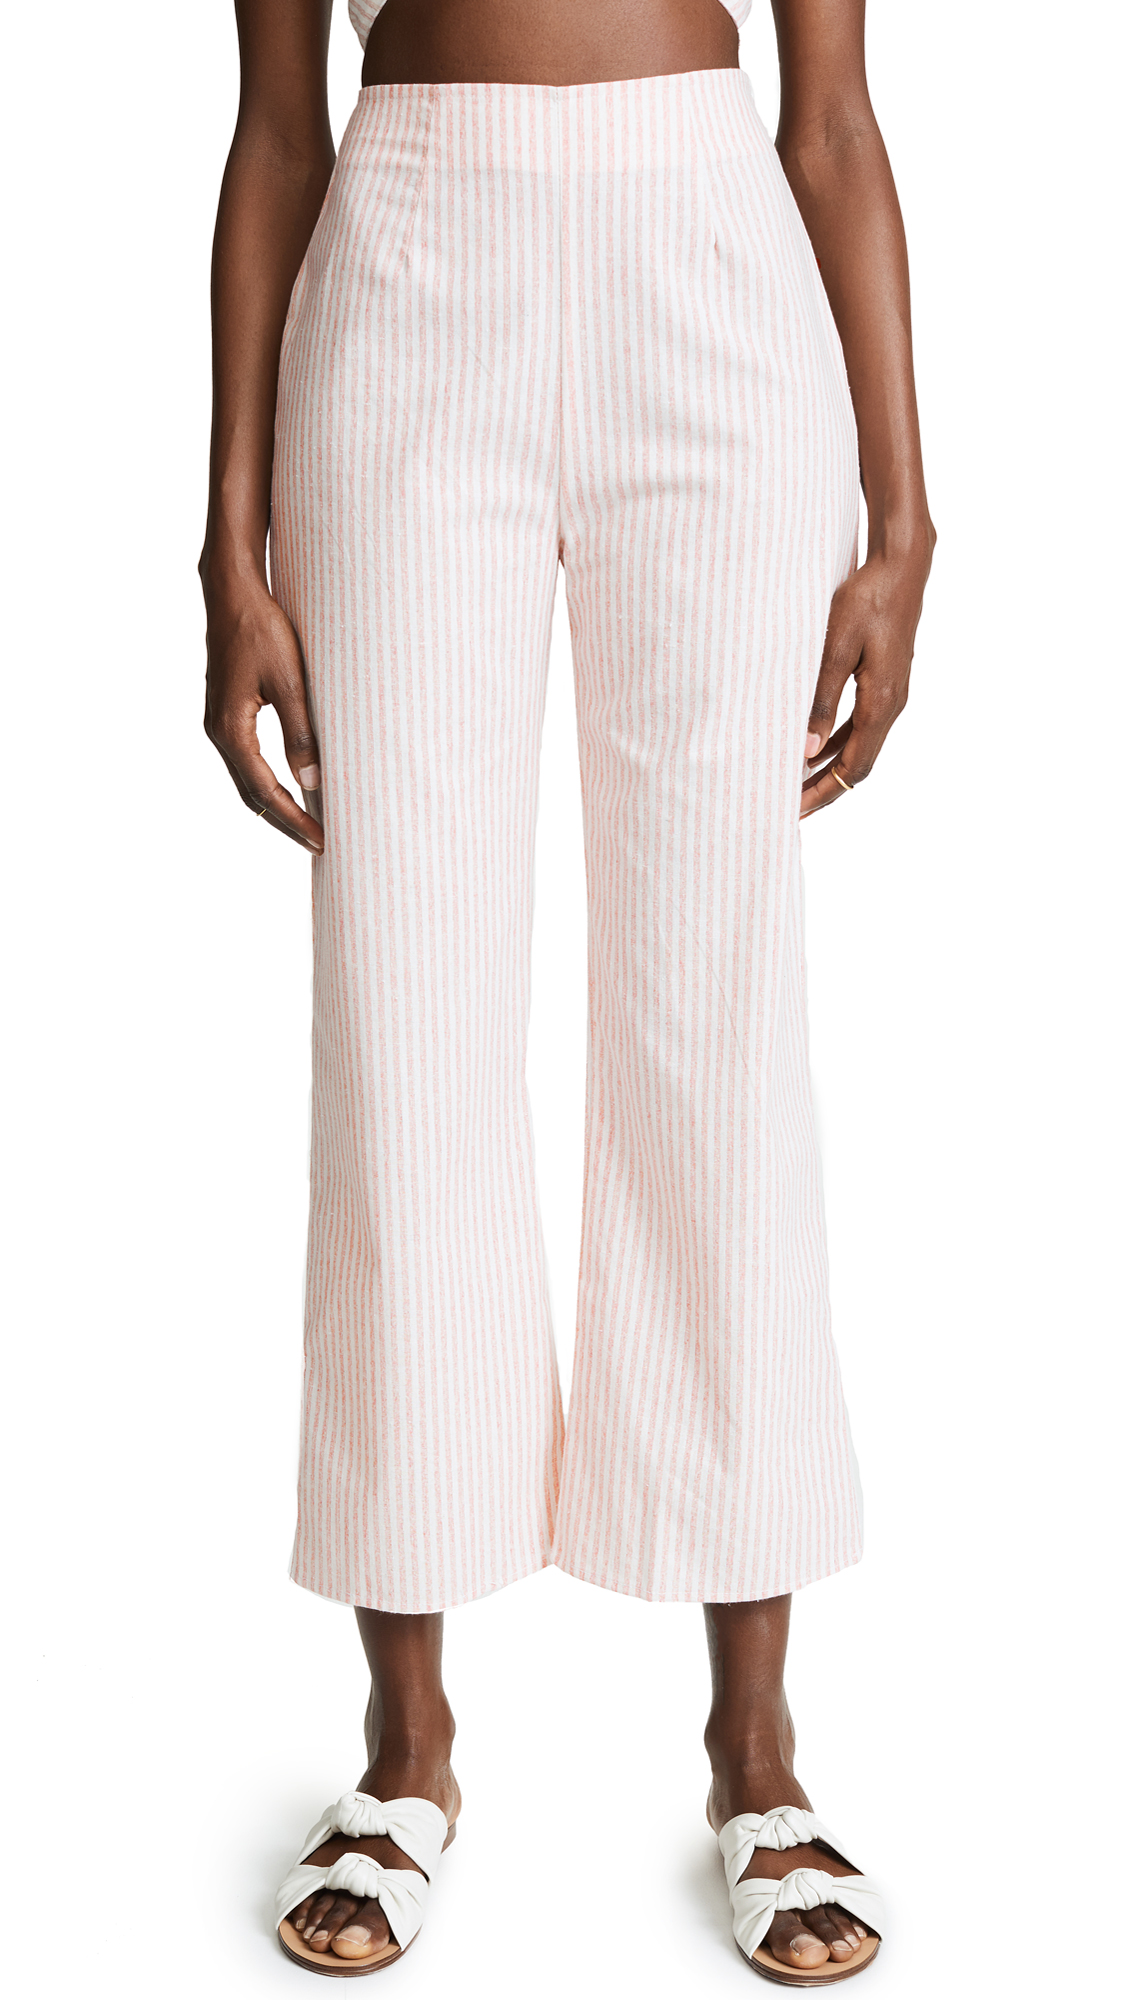 Flynn Skye Parker Pants - Rose Stripe